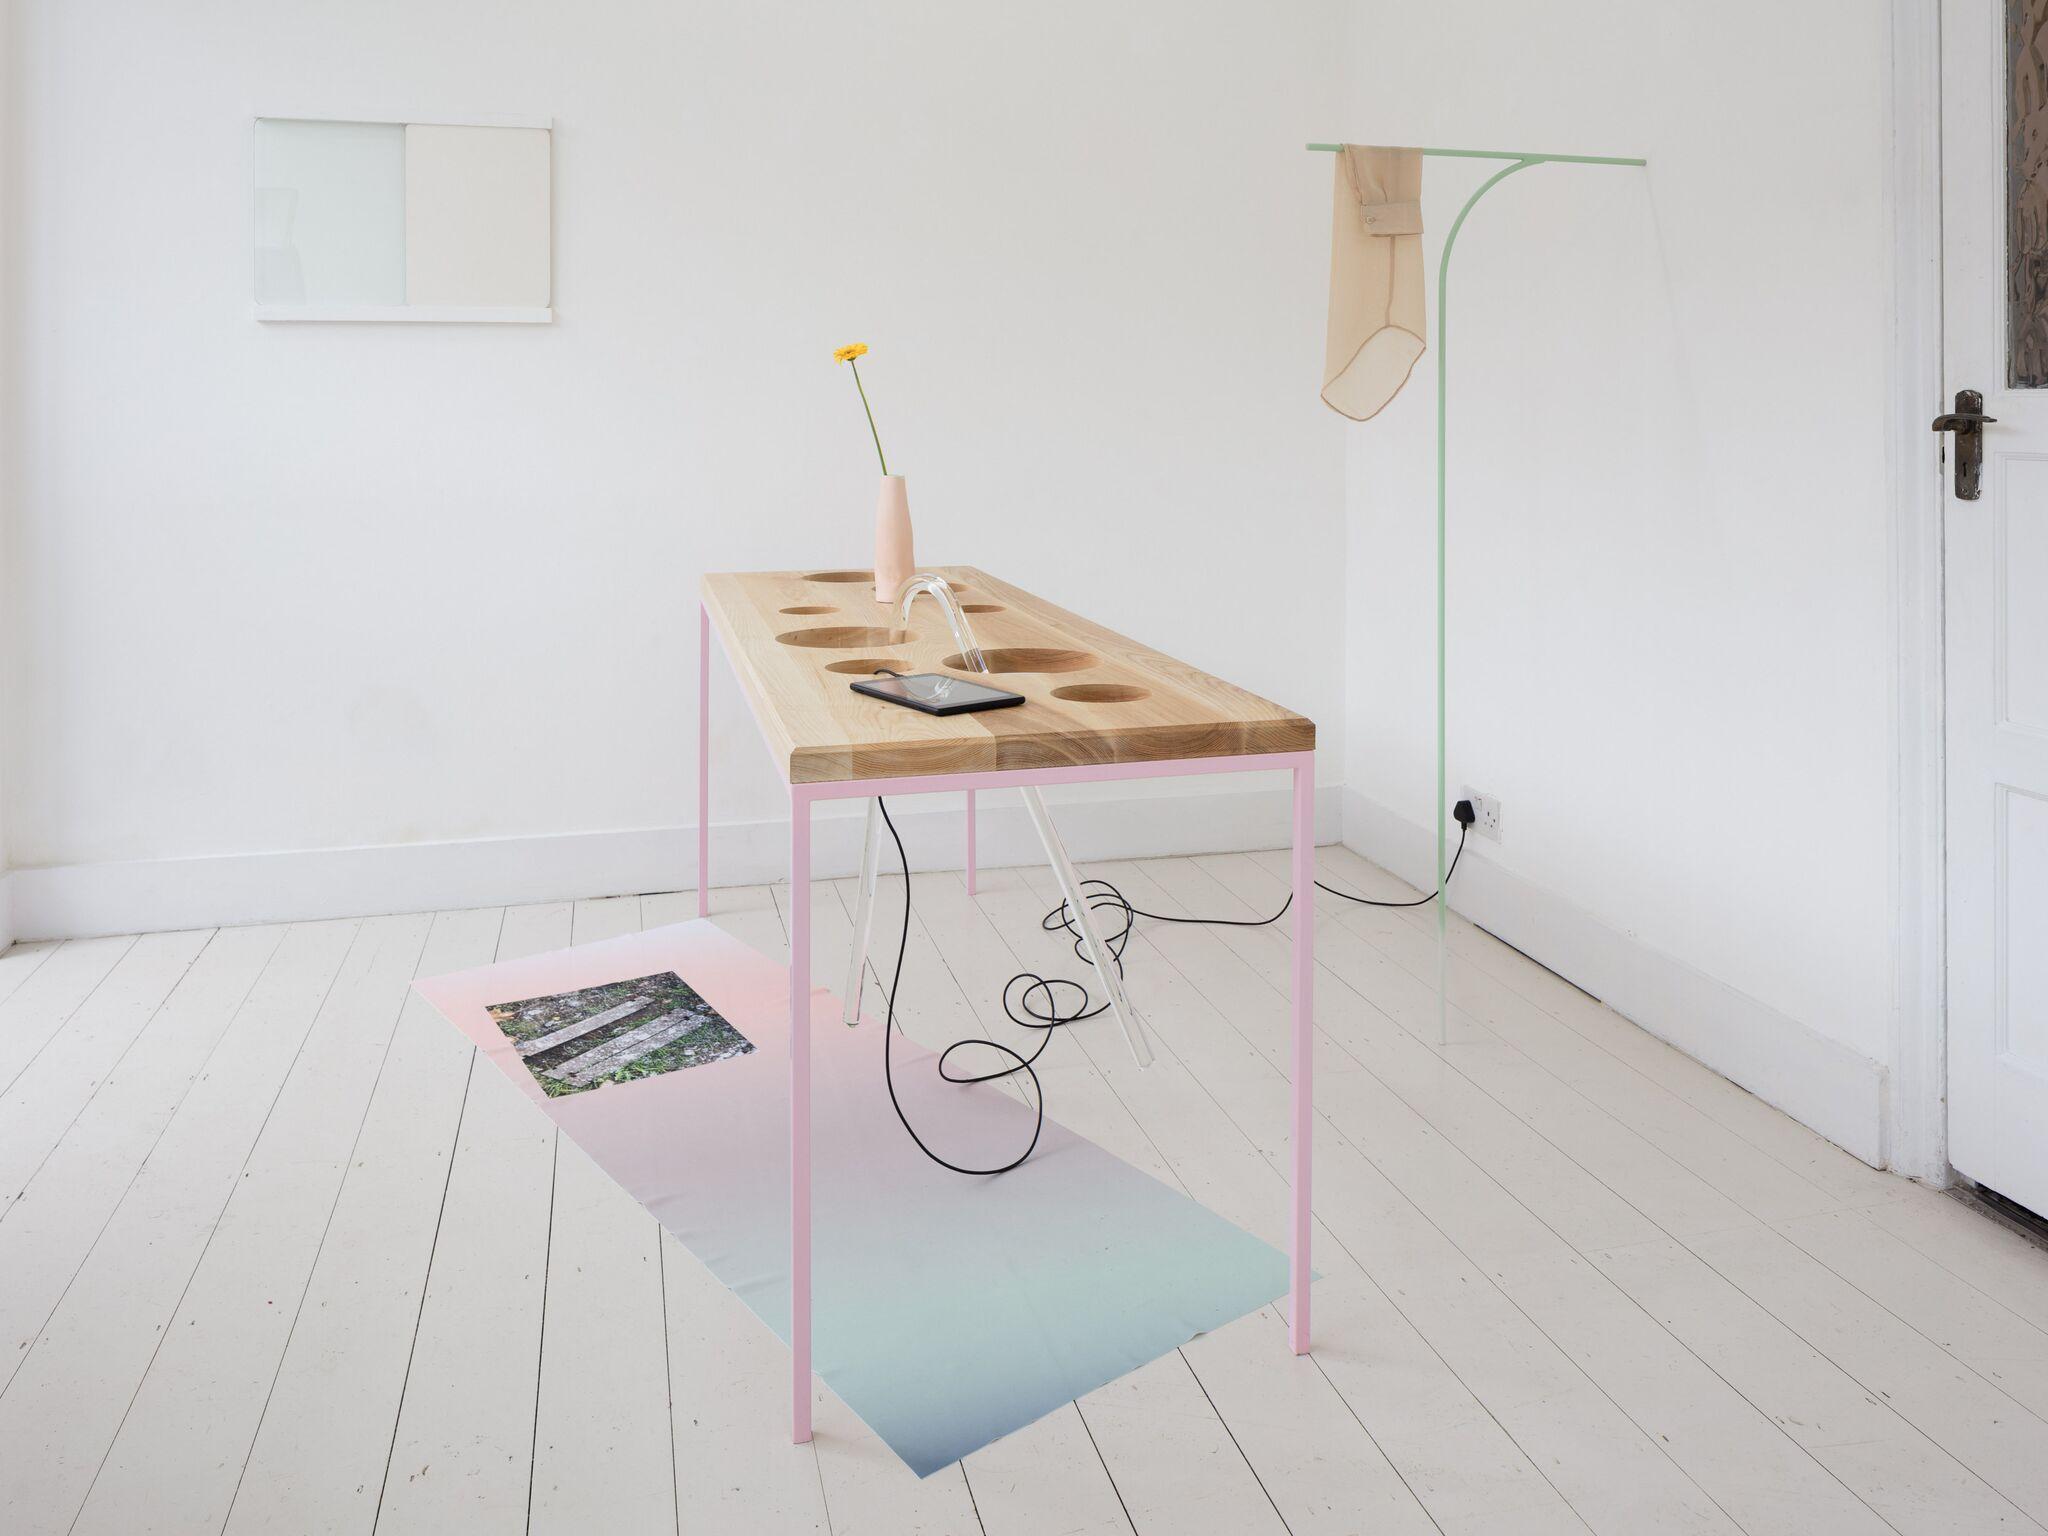 Ben Cain, Passive Imperative Participation Vibe, installation view, 2018. Documentation: Plastiques Photography (Ben Cain - Passive Imperative Participation Vibe 10)